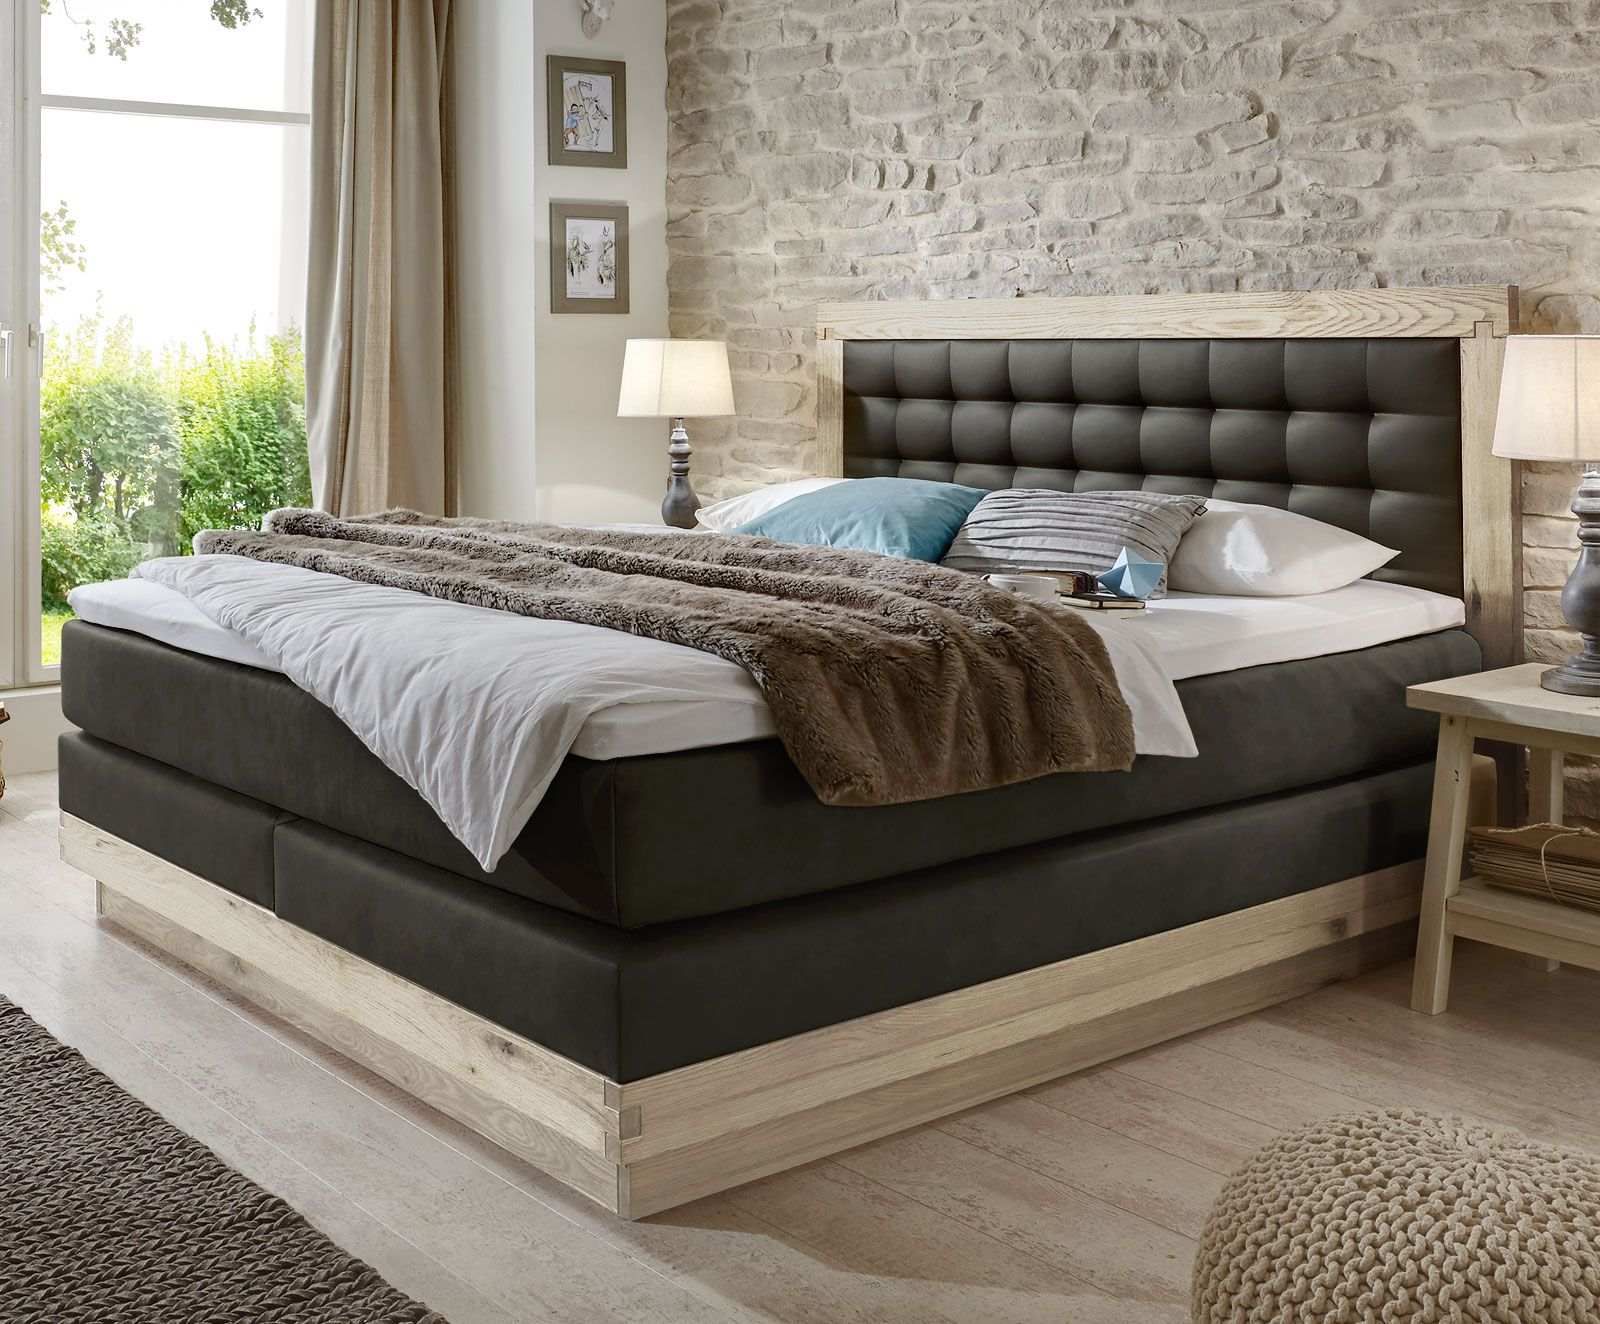 boxspringbett galicia indoor boxspringbett bett und. Black Bedroom Furniture Sets. Home Design Ideas